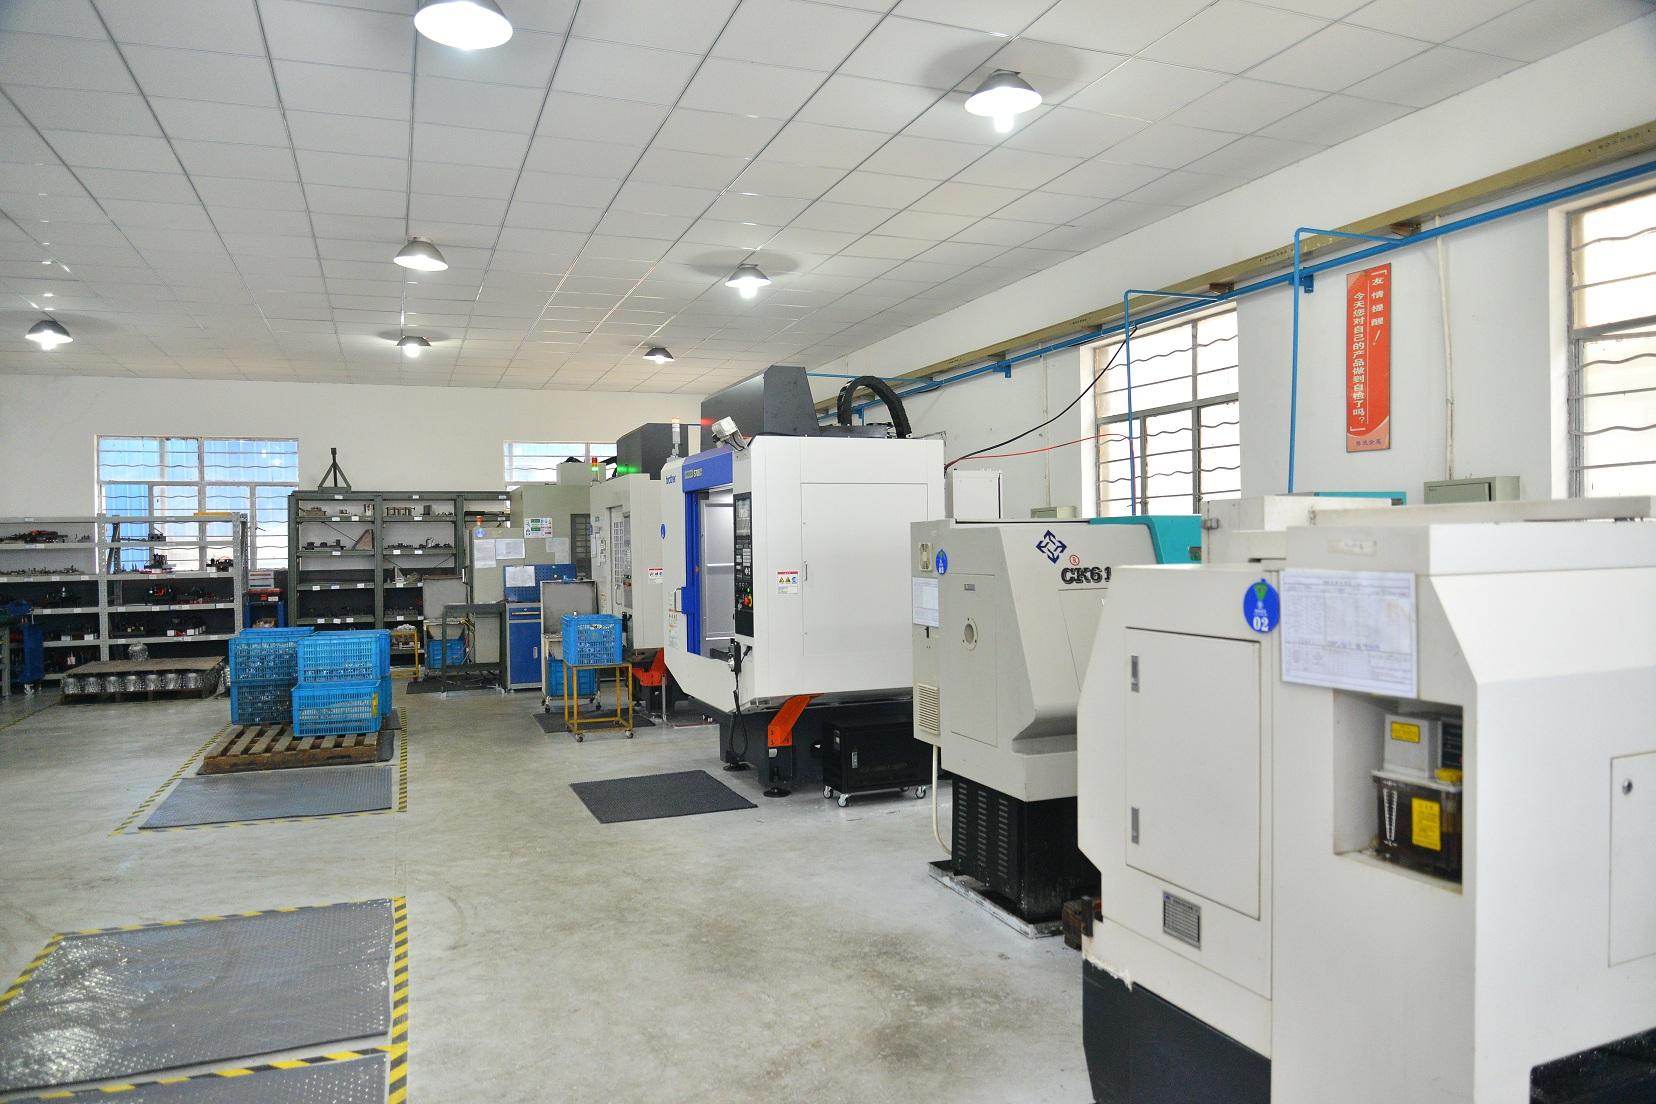 CNC work shop